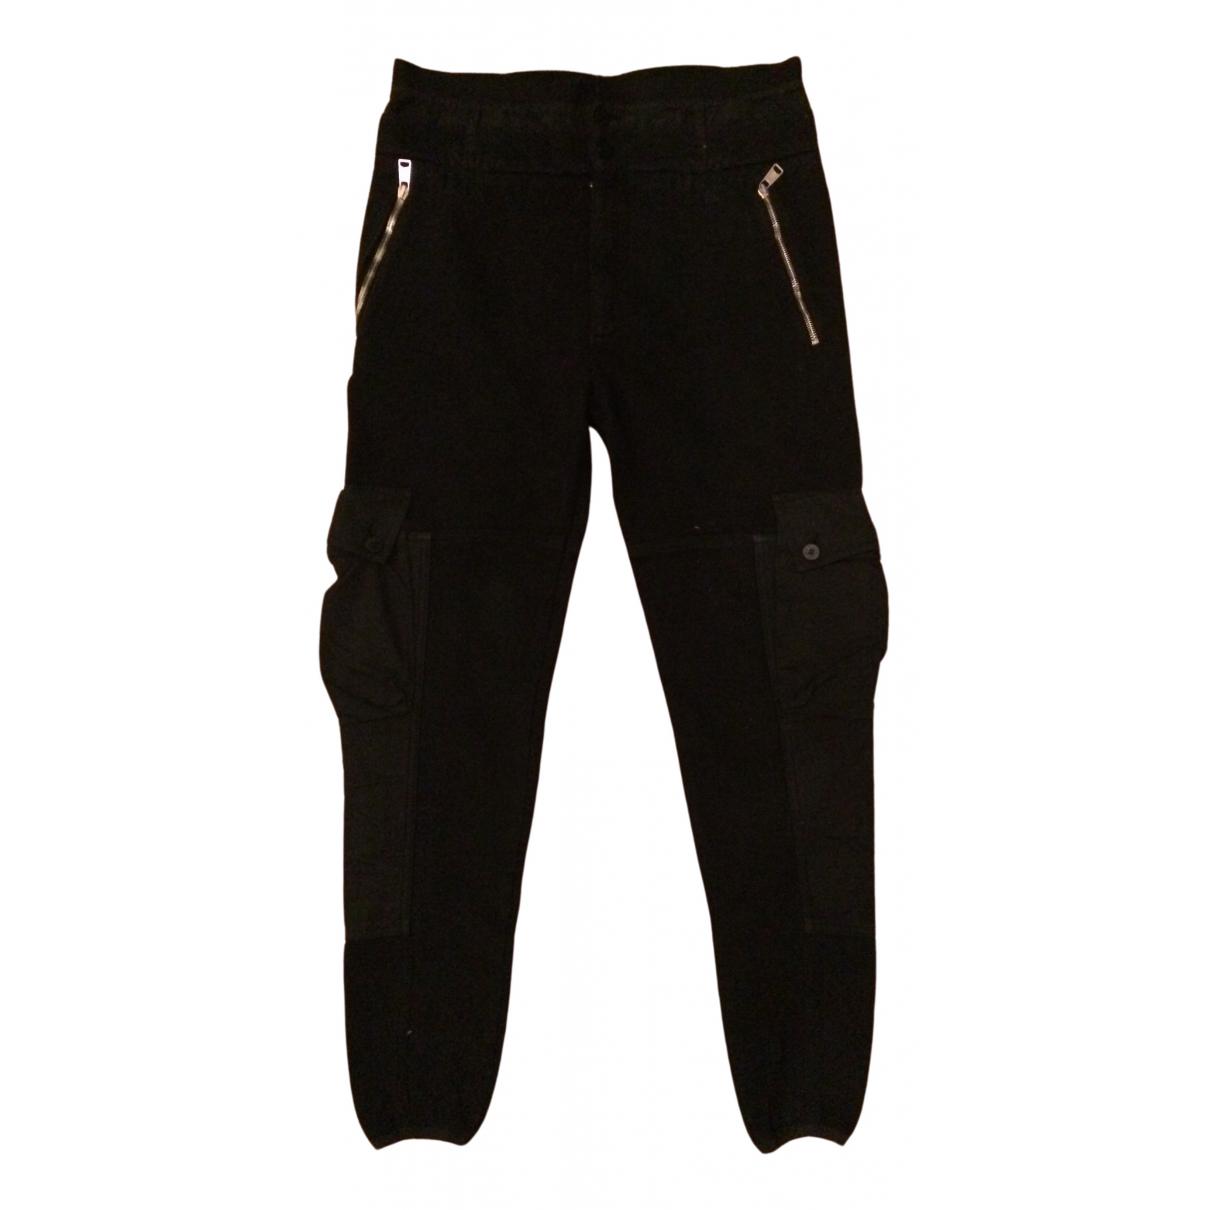 Alexander Mcqueen \N Black Cotton Trousers for Men 40 UK - US